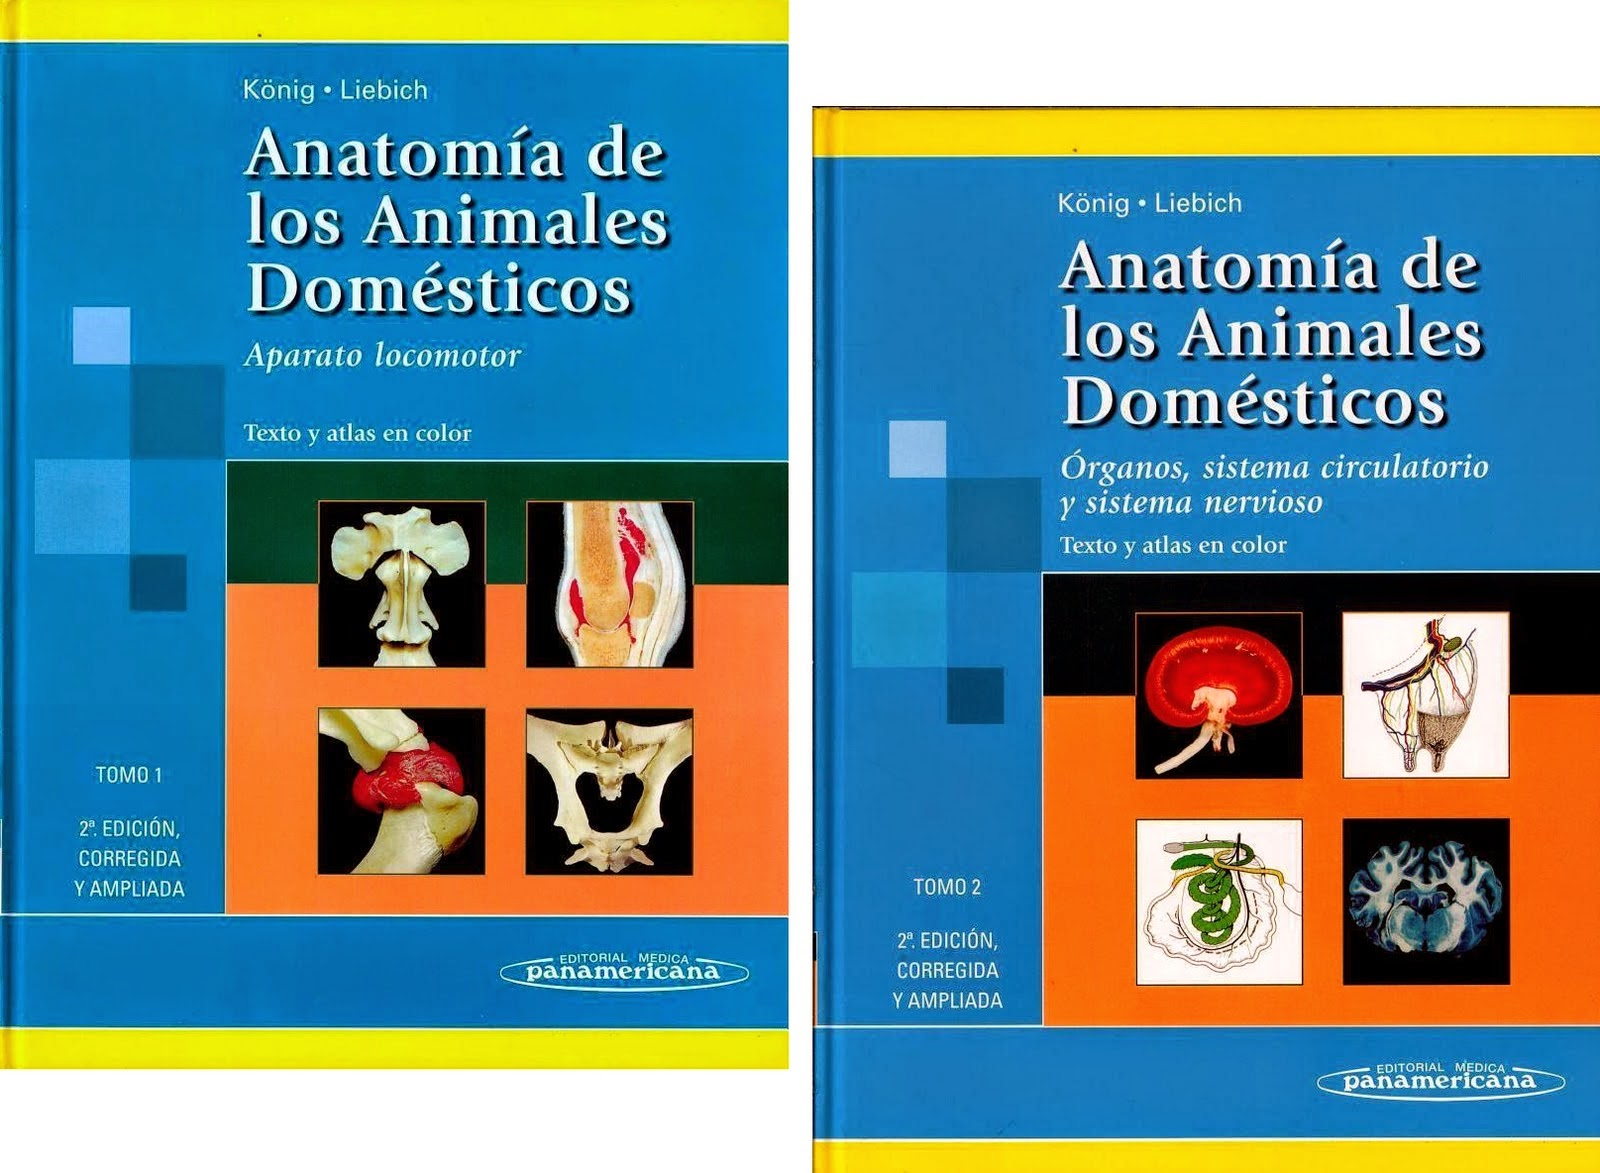 Atlas digital de osteologia veterinaria - Cable tv playout software ...